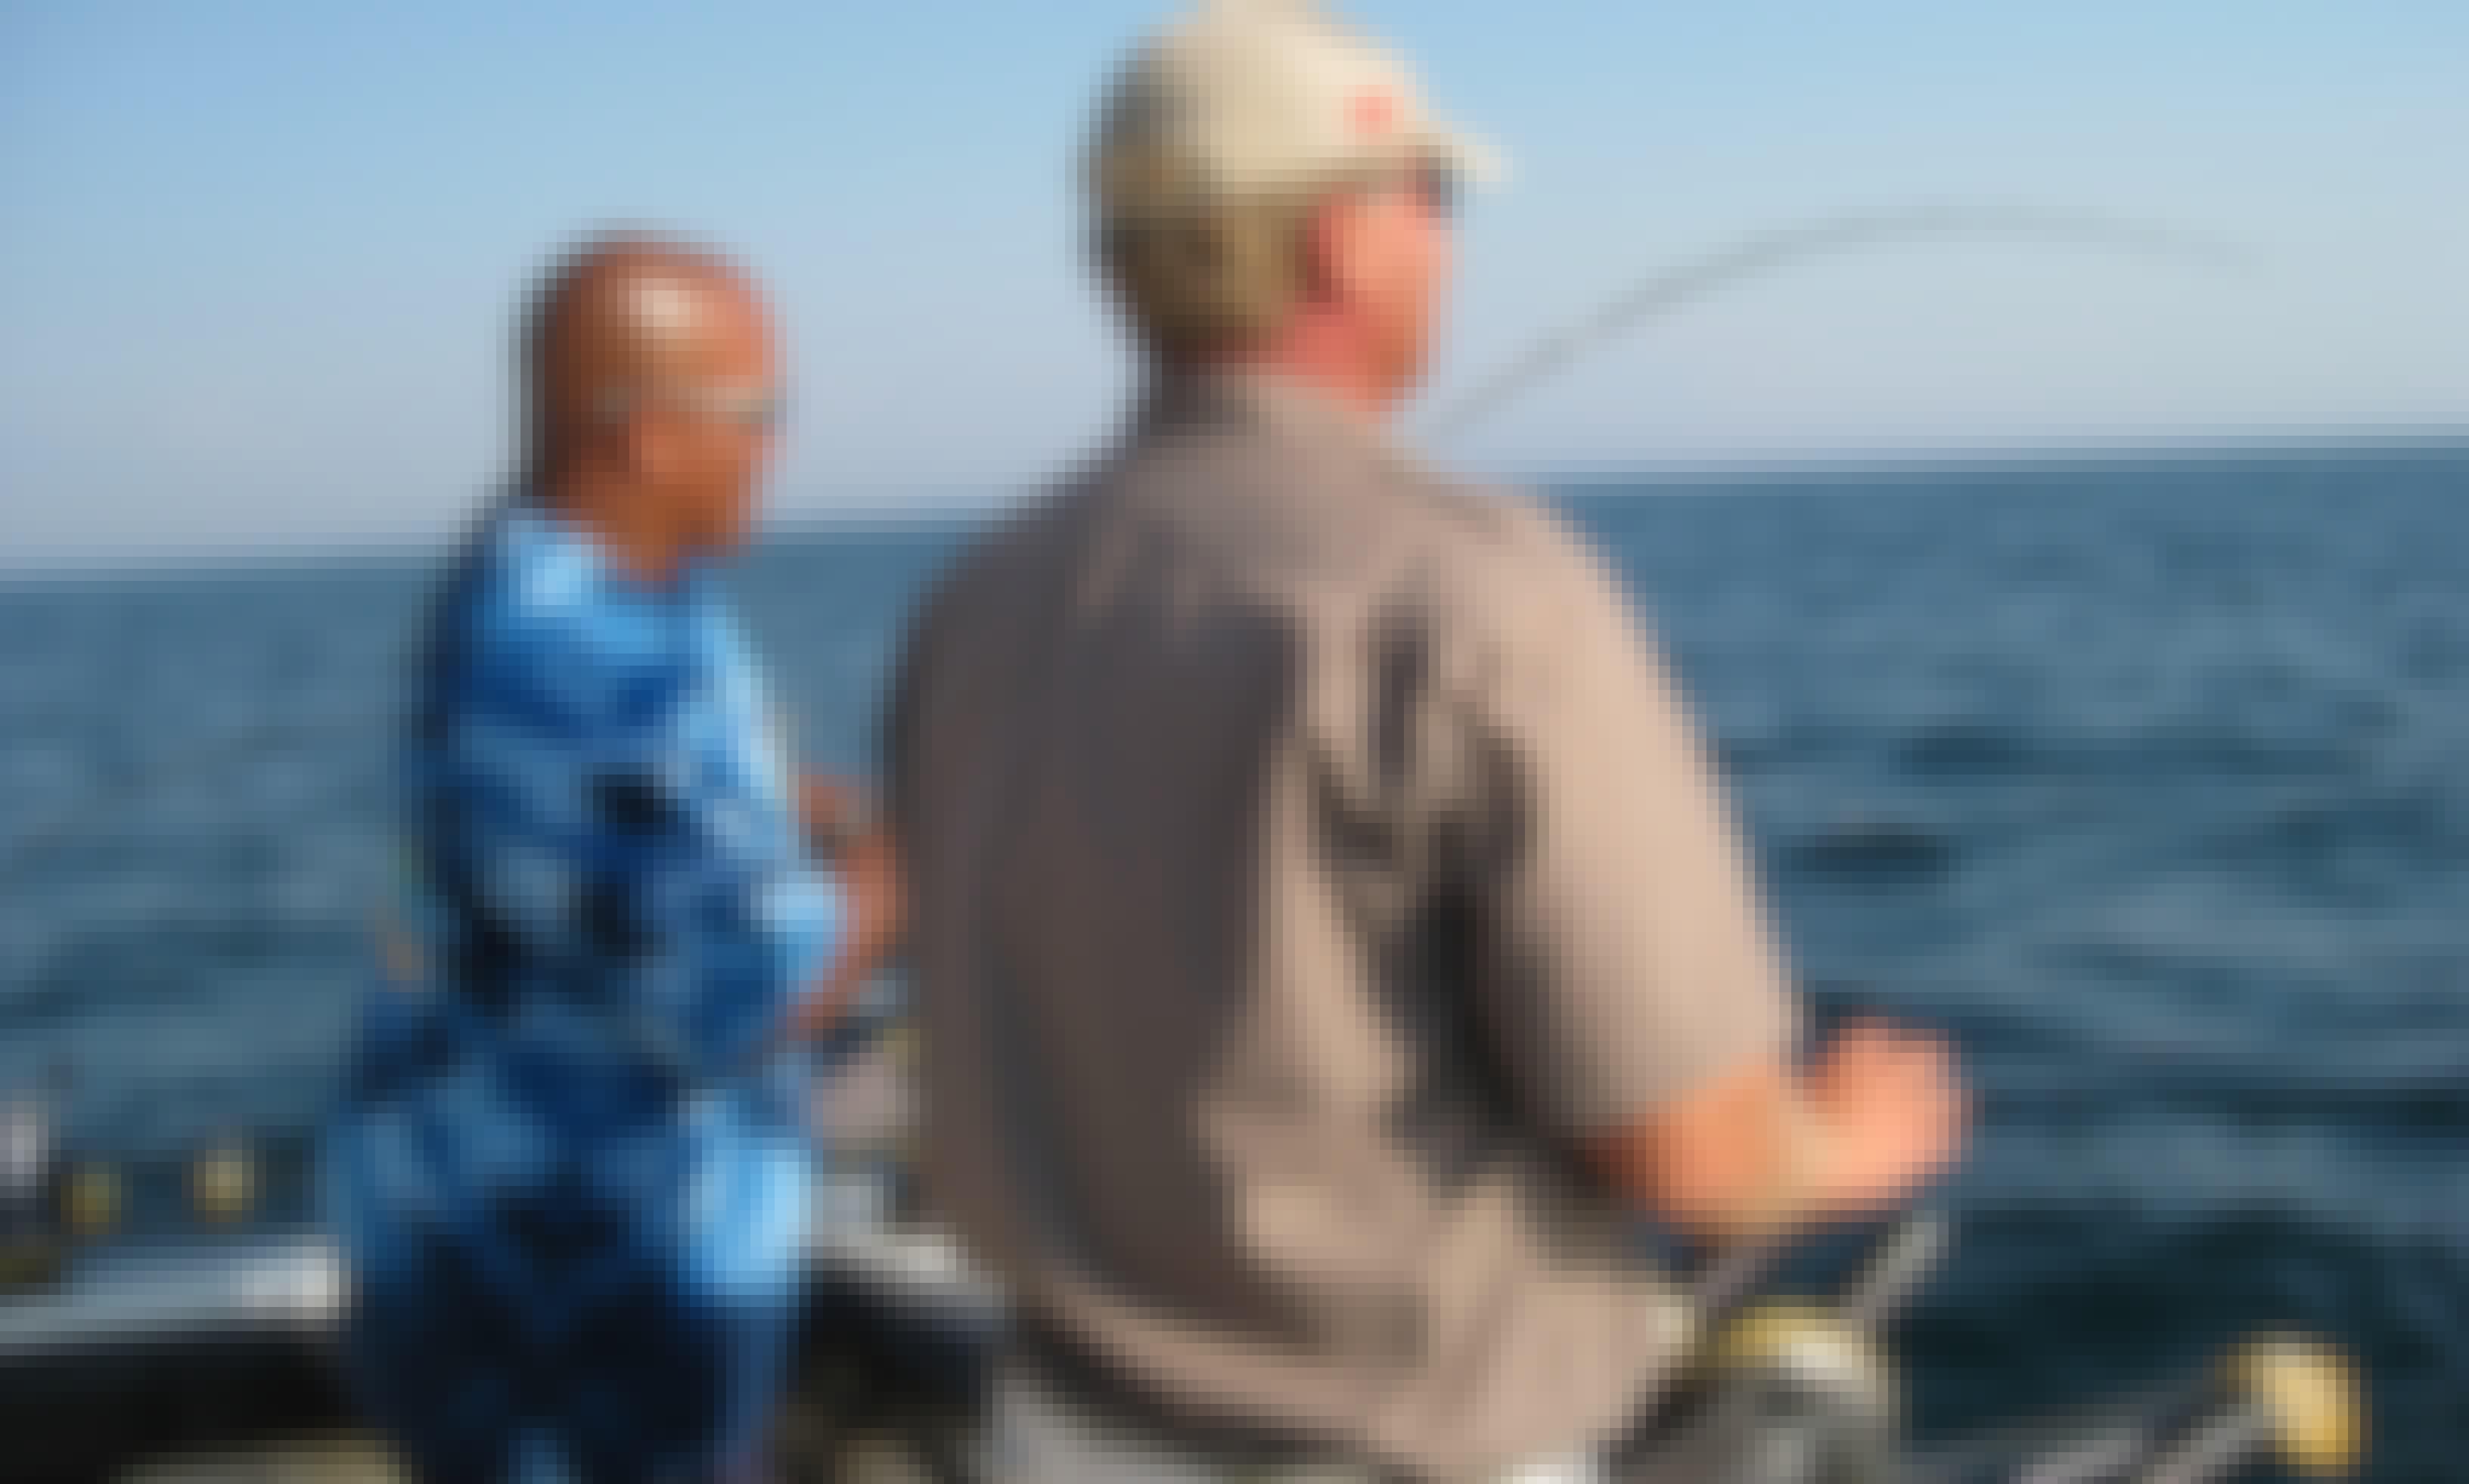 36' Fishing Trips Charter In St. Joseph Charter Township